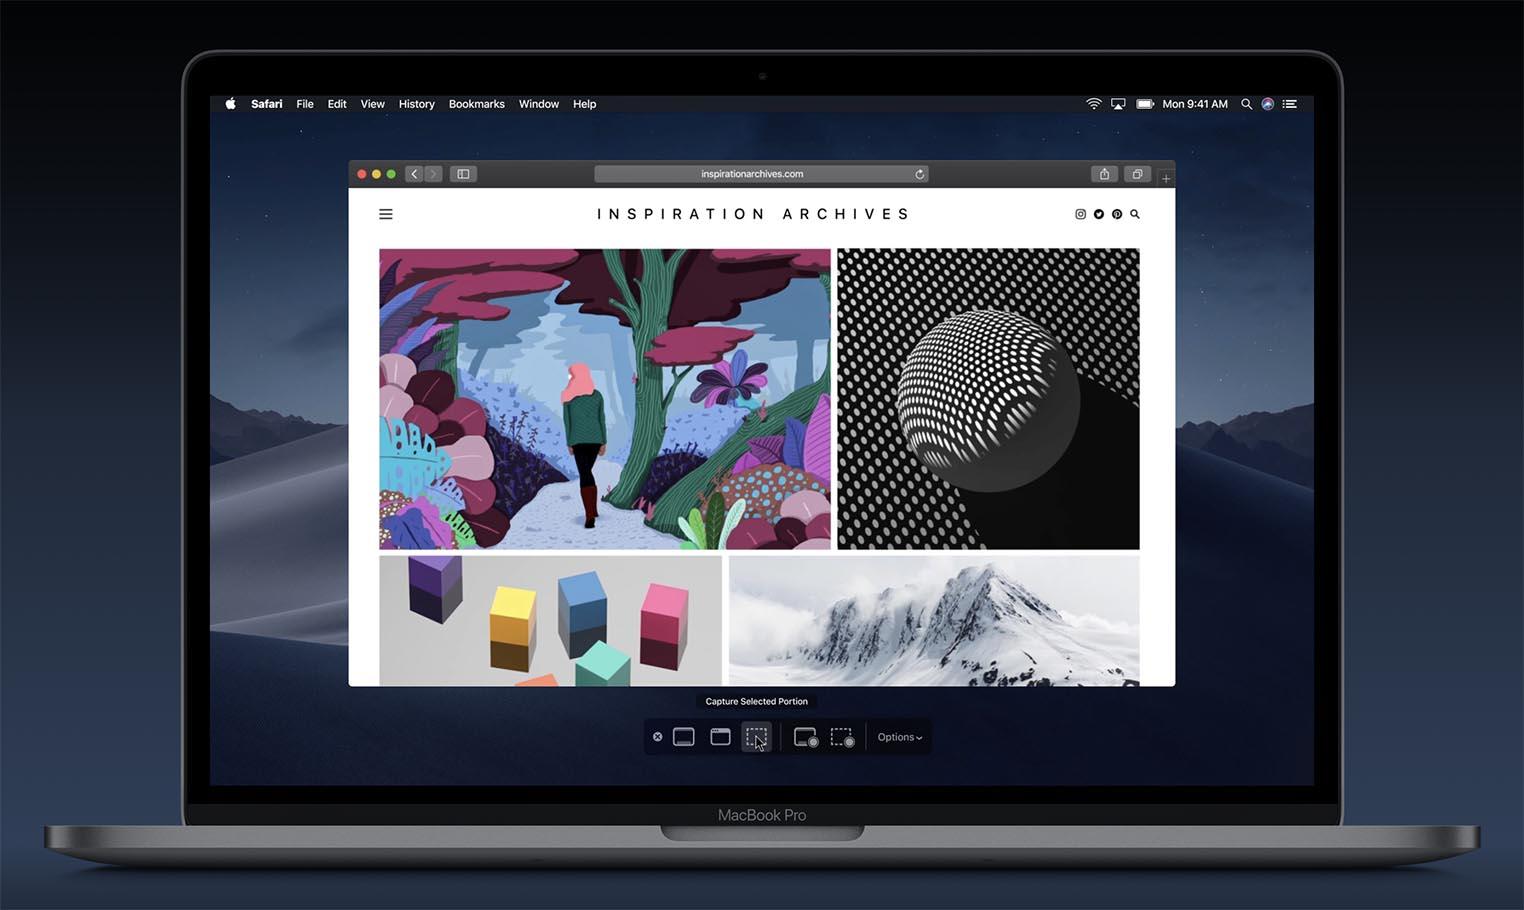 macOS 10.14 Mojave copie d'écran